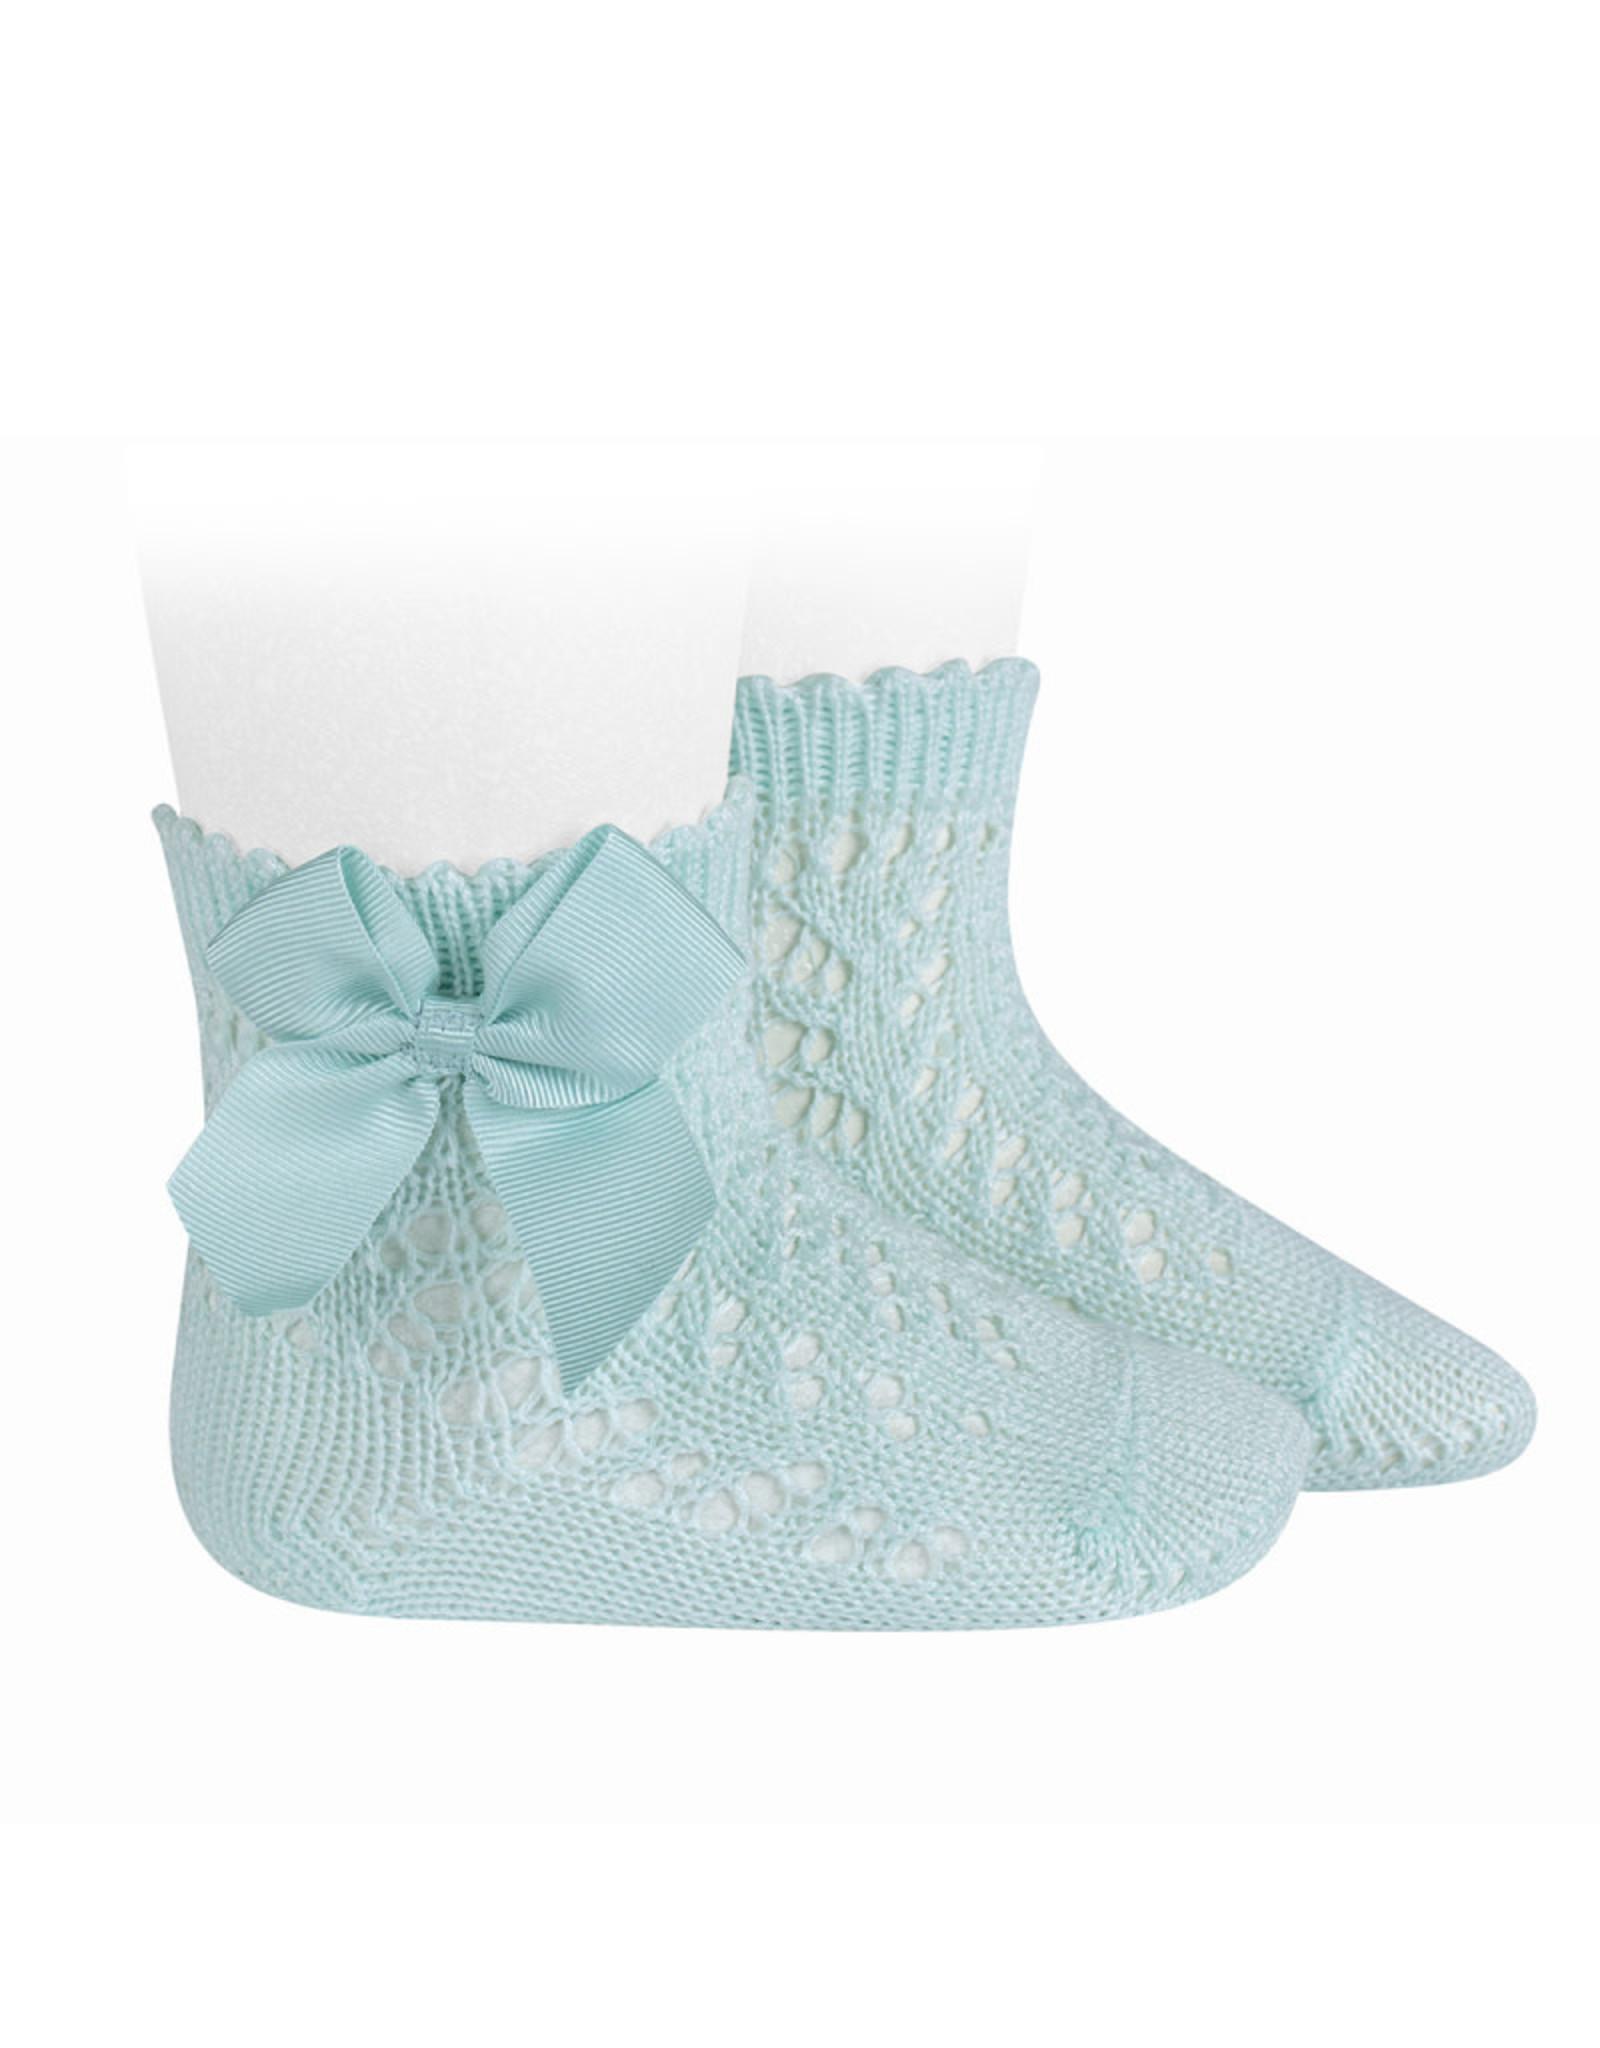 CONDOR Aquamarine Openwork Short Socks with Bow